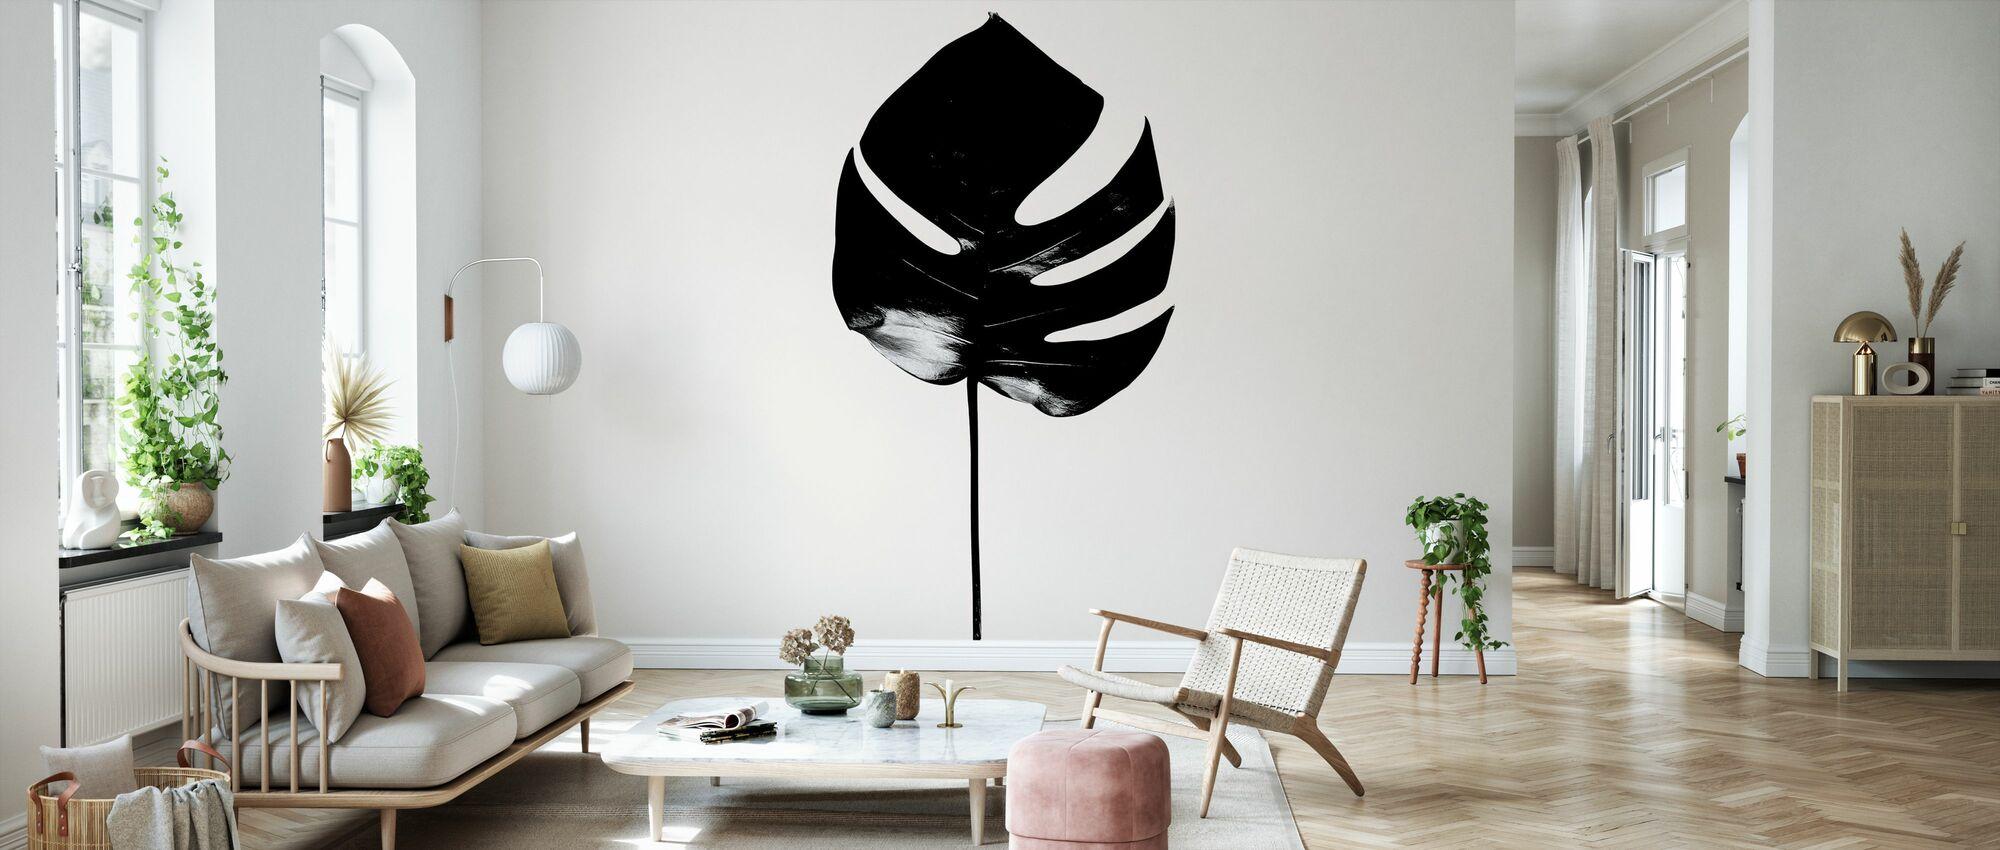 Monstera - Zwart - Behang - Woonkamer